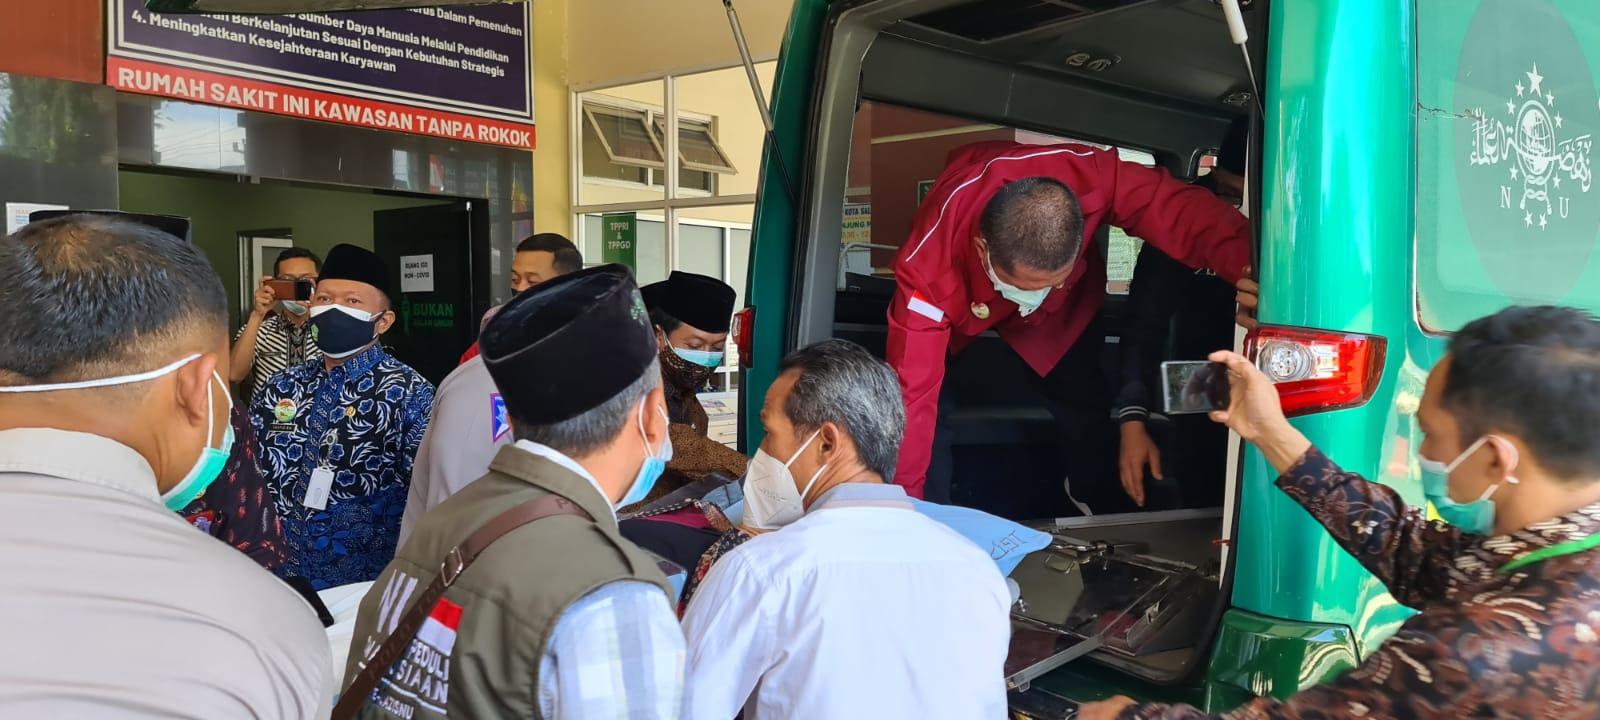 KH Miftakhul Akhyar, Rois Aam PBNU Kecelakaan di Salatiga: Alhamdulillah Selamat